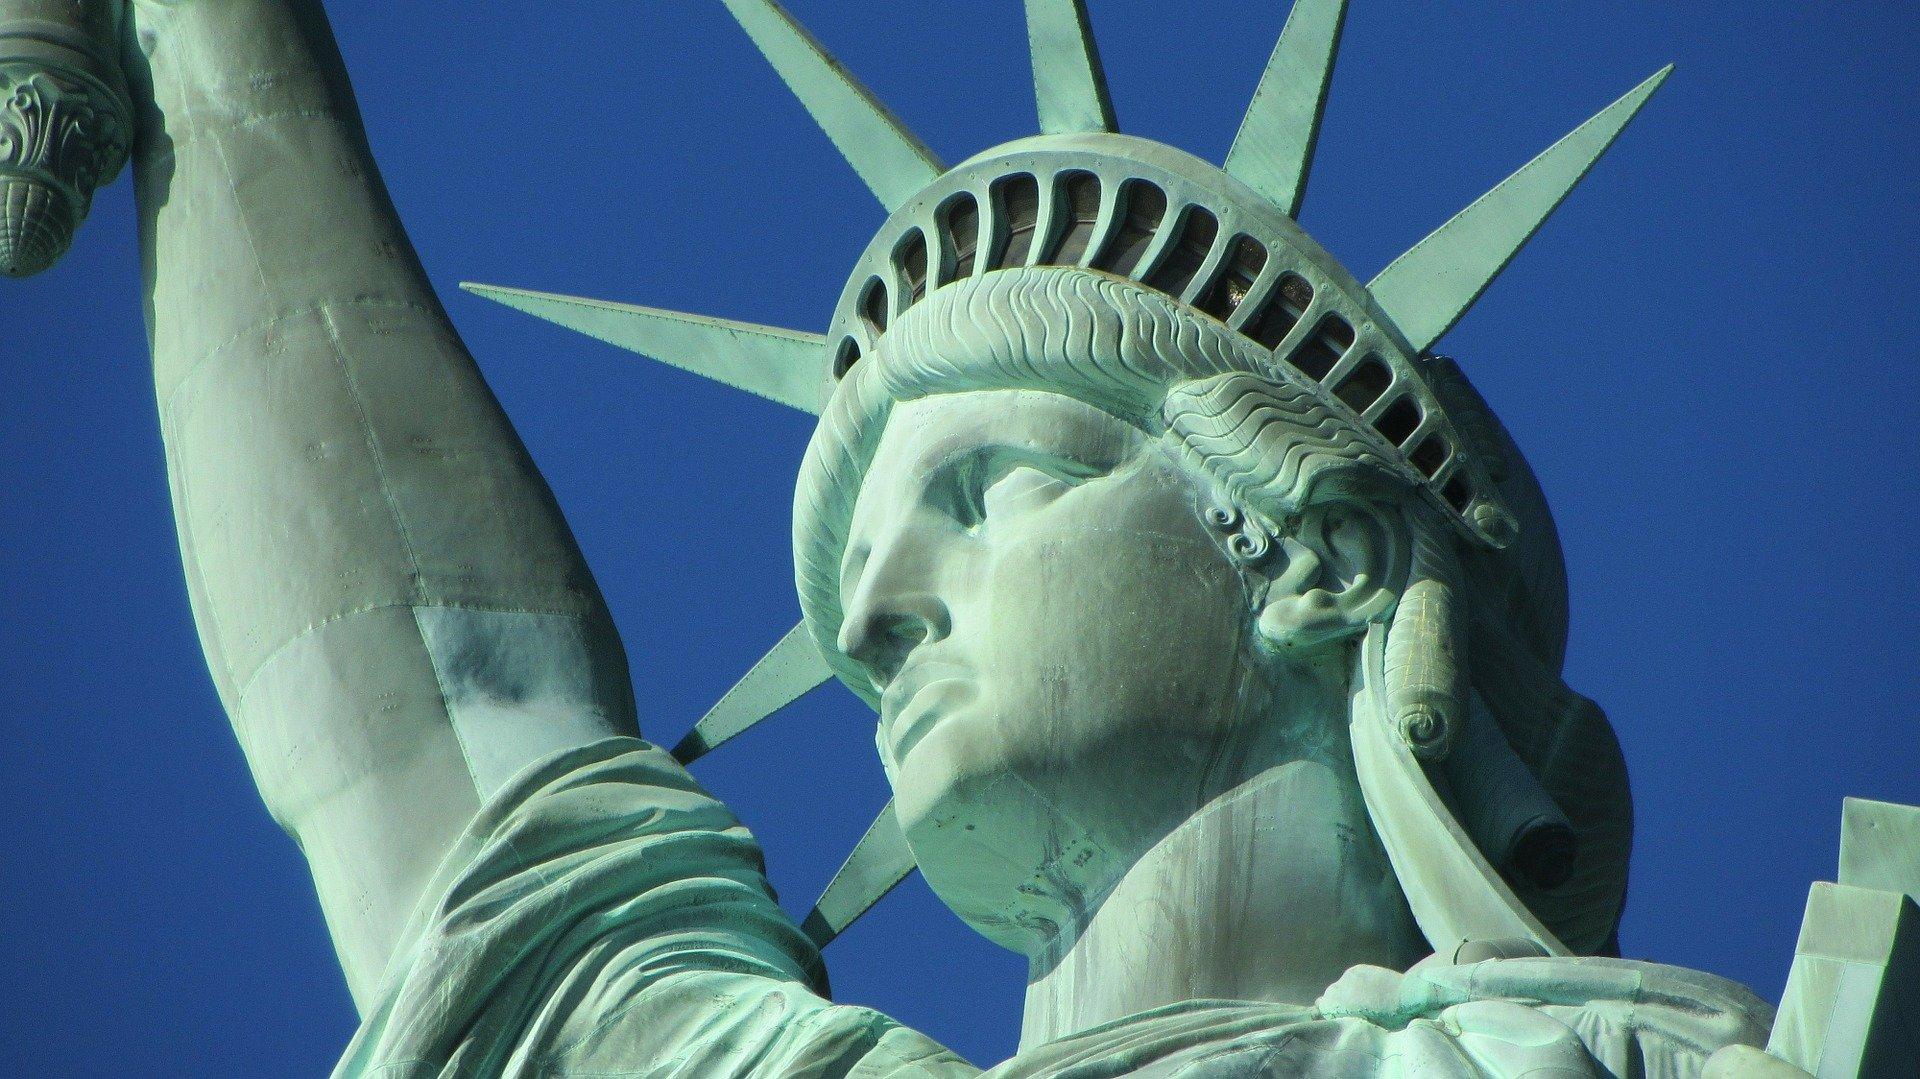 statue-of-liberty-267949_1920 (1)